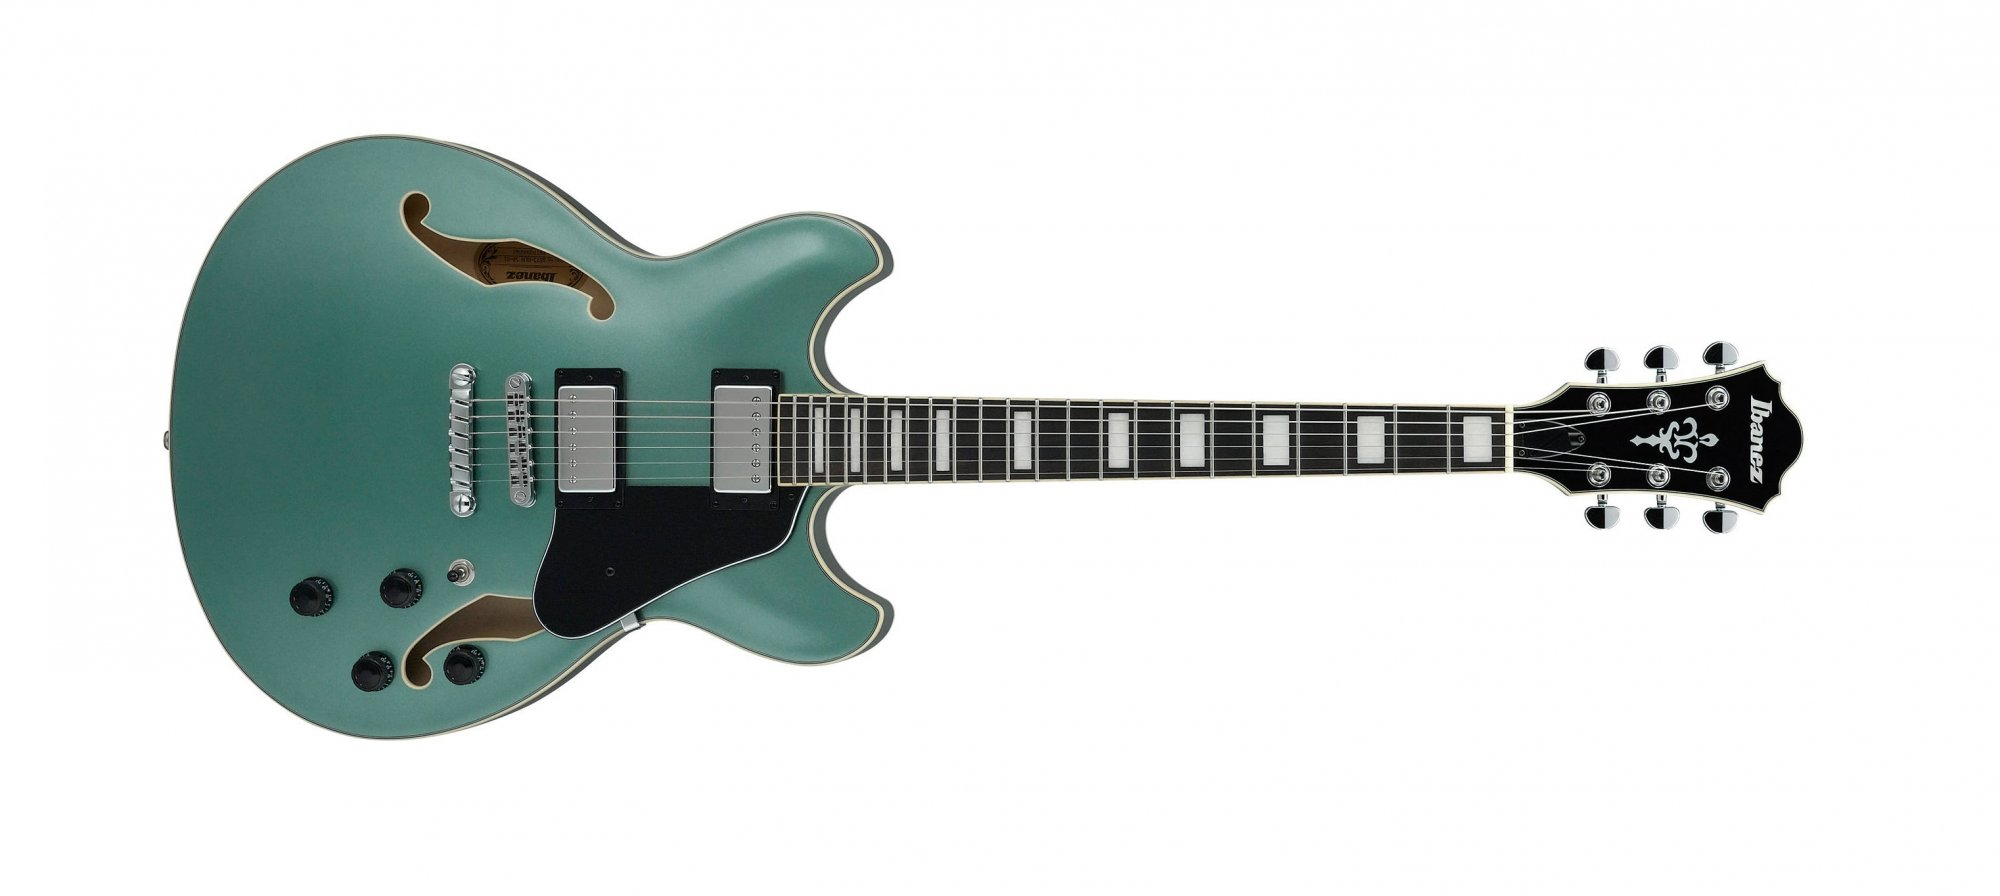 Ibanez AS73 Semi Hollow Electric Guitar, Olive Metallic